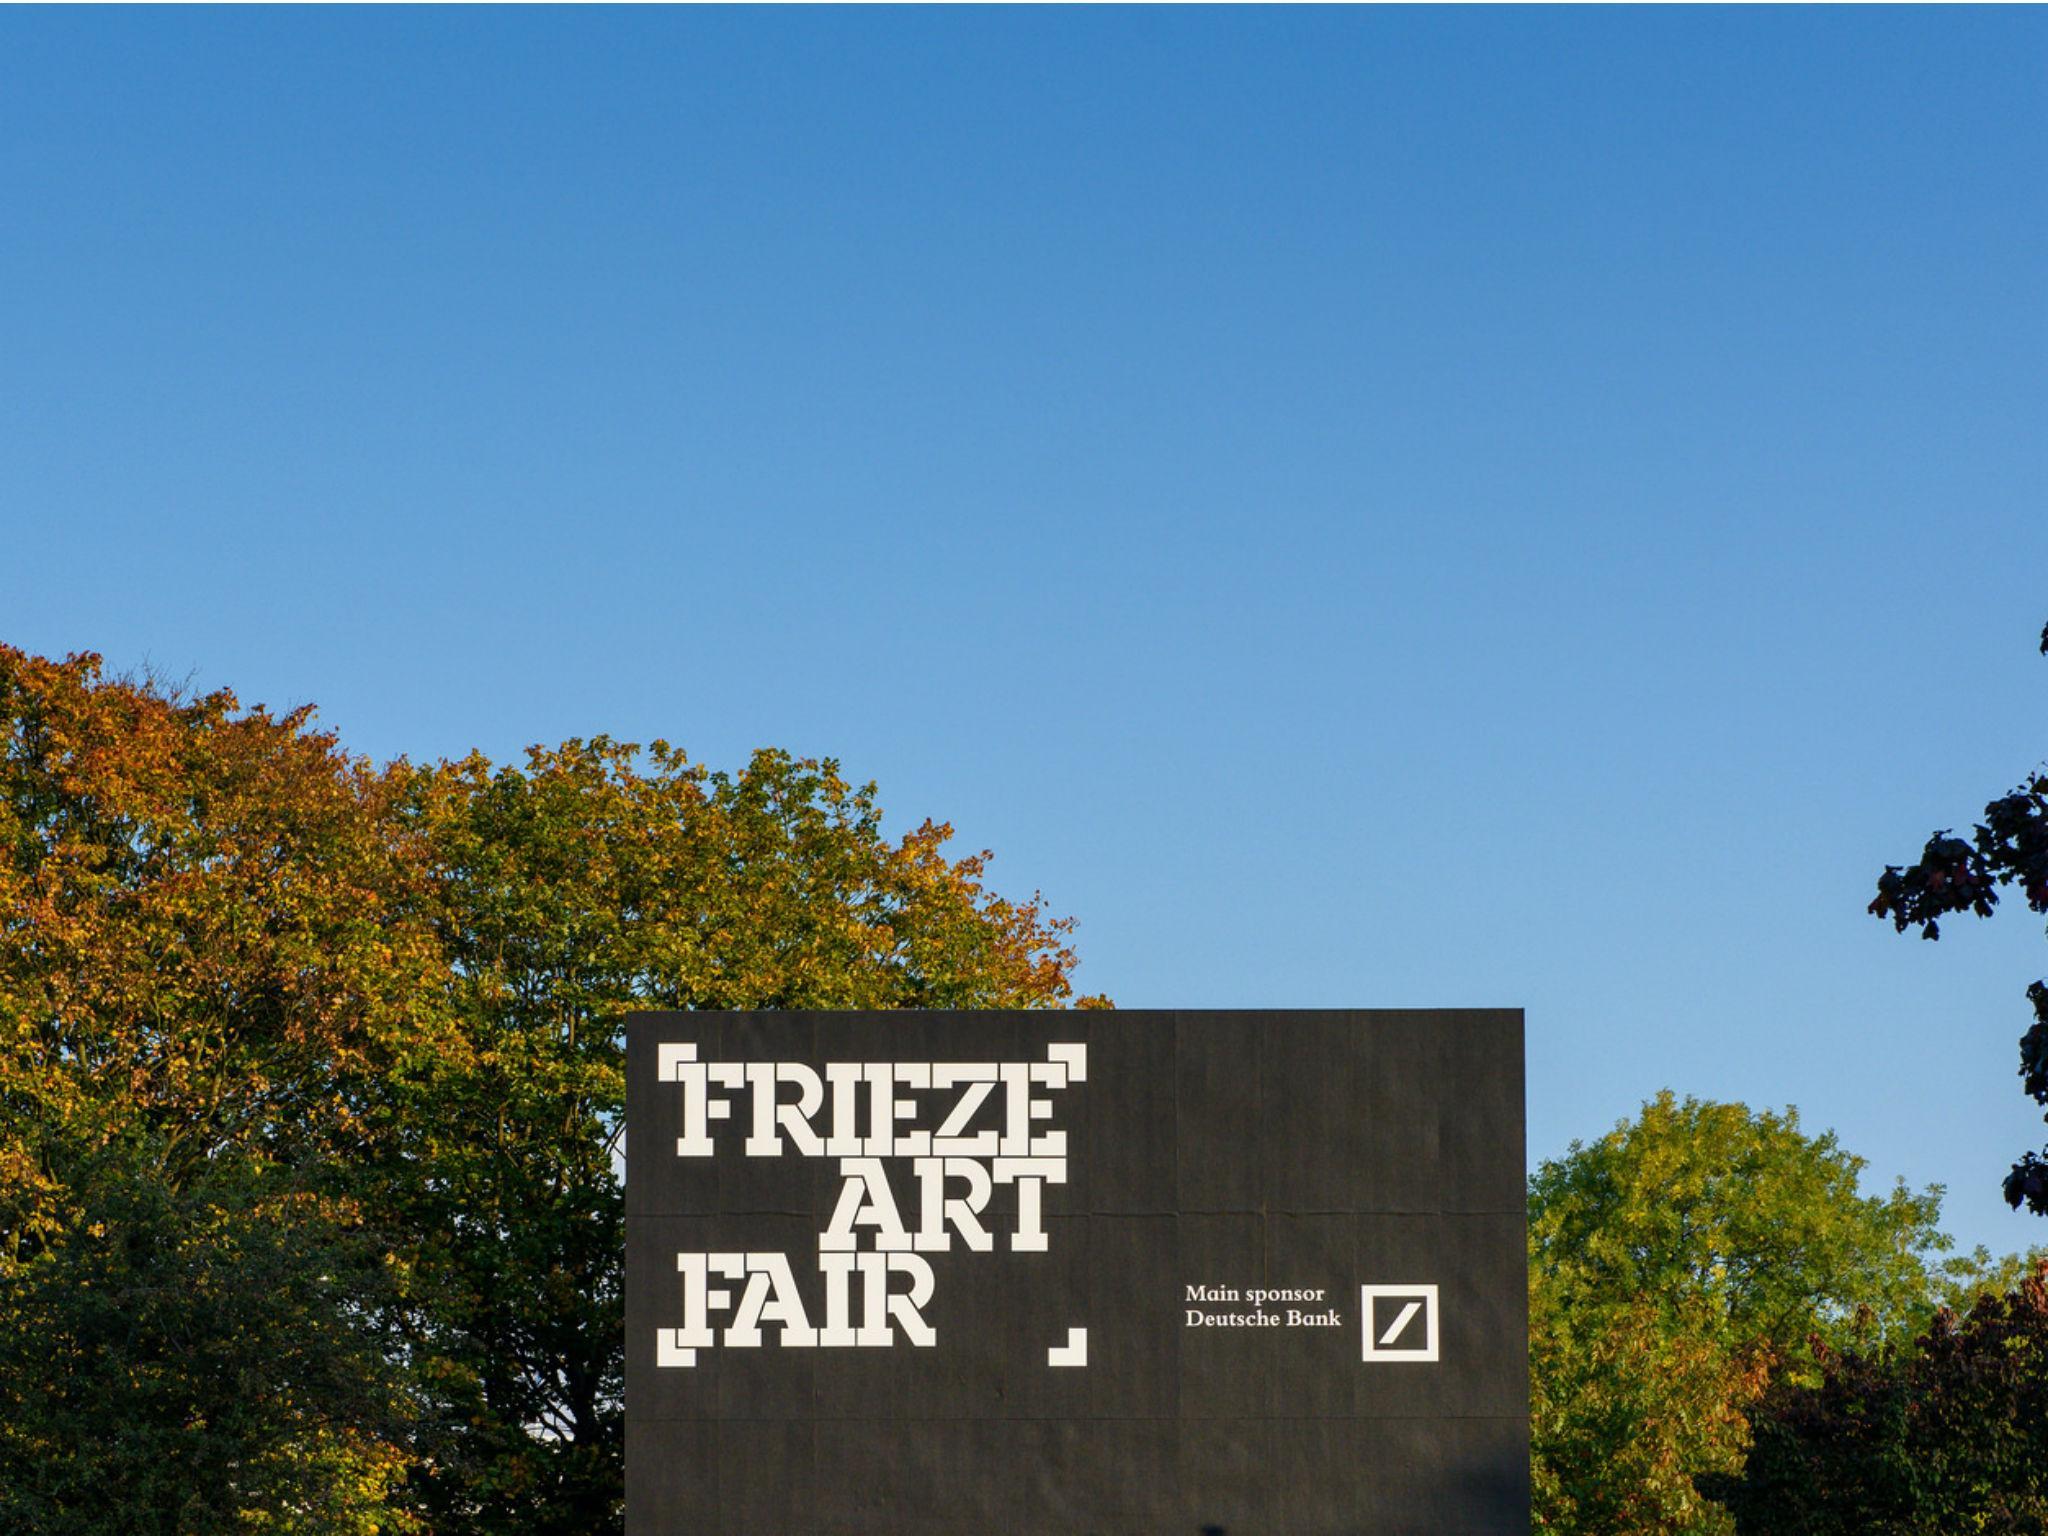 Frieze Art Fair: Is it is just an overblown trade fair? | The Independentindependent_brand_ident_LOGOUntitled